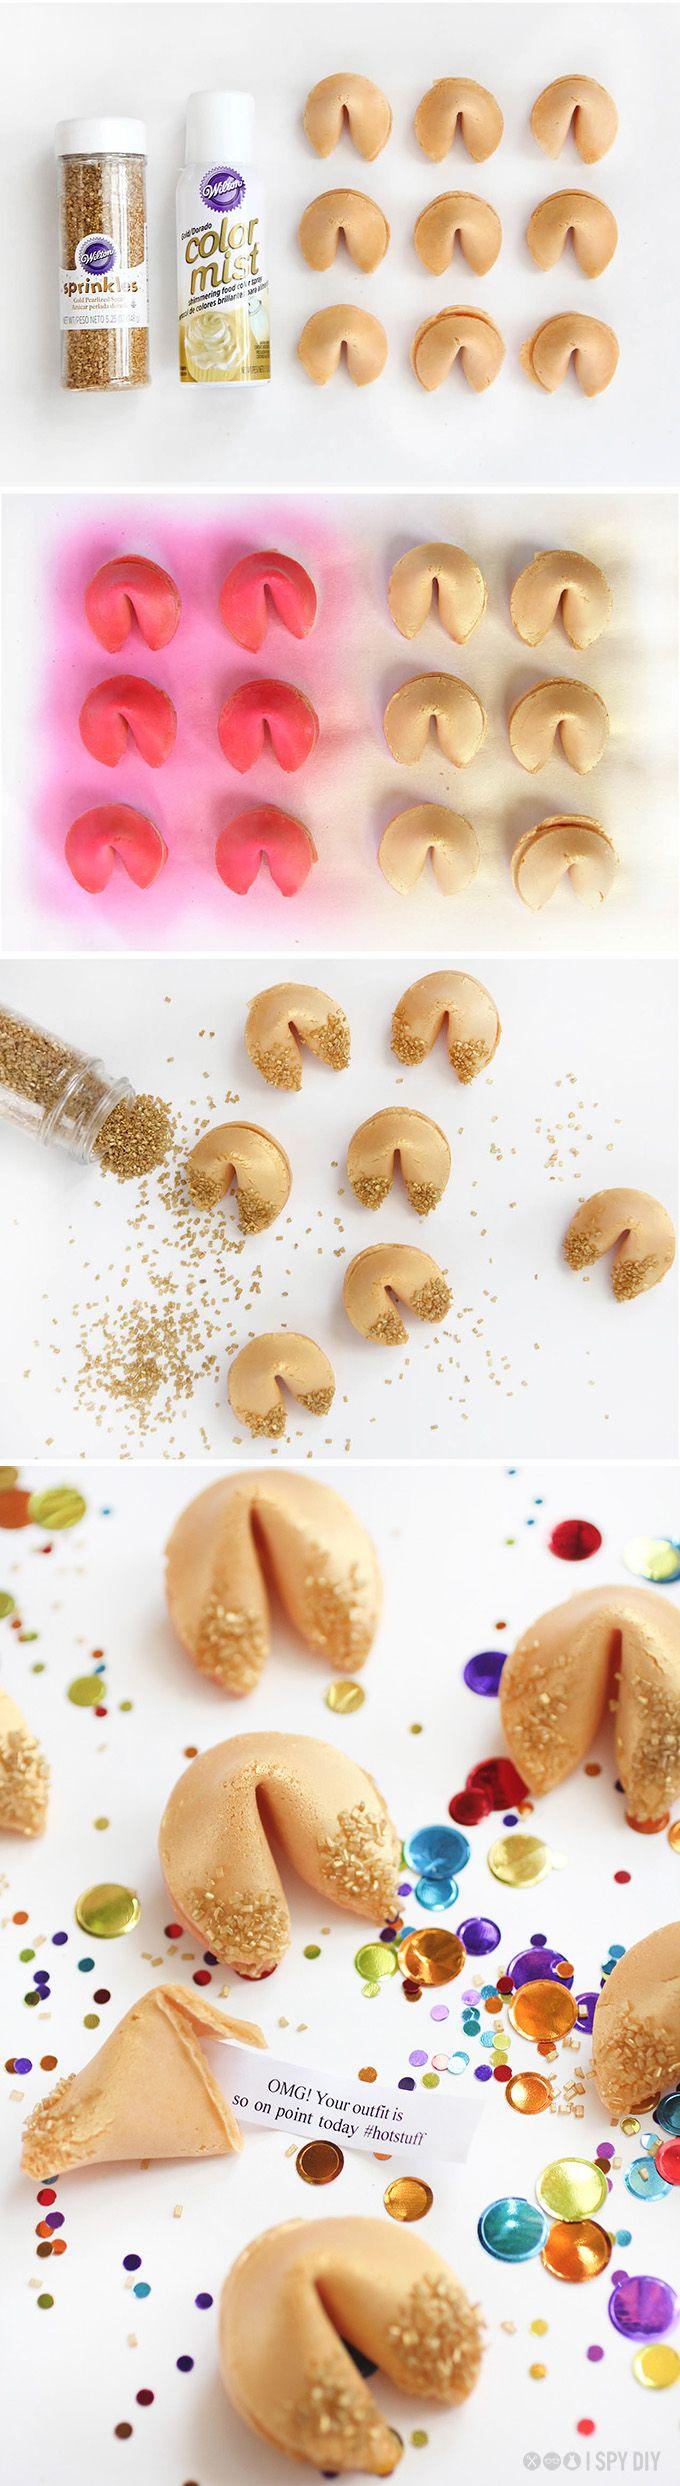 MY DIY | Gold Glitter Fortune Cookie | I SPY DIY